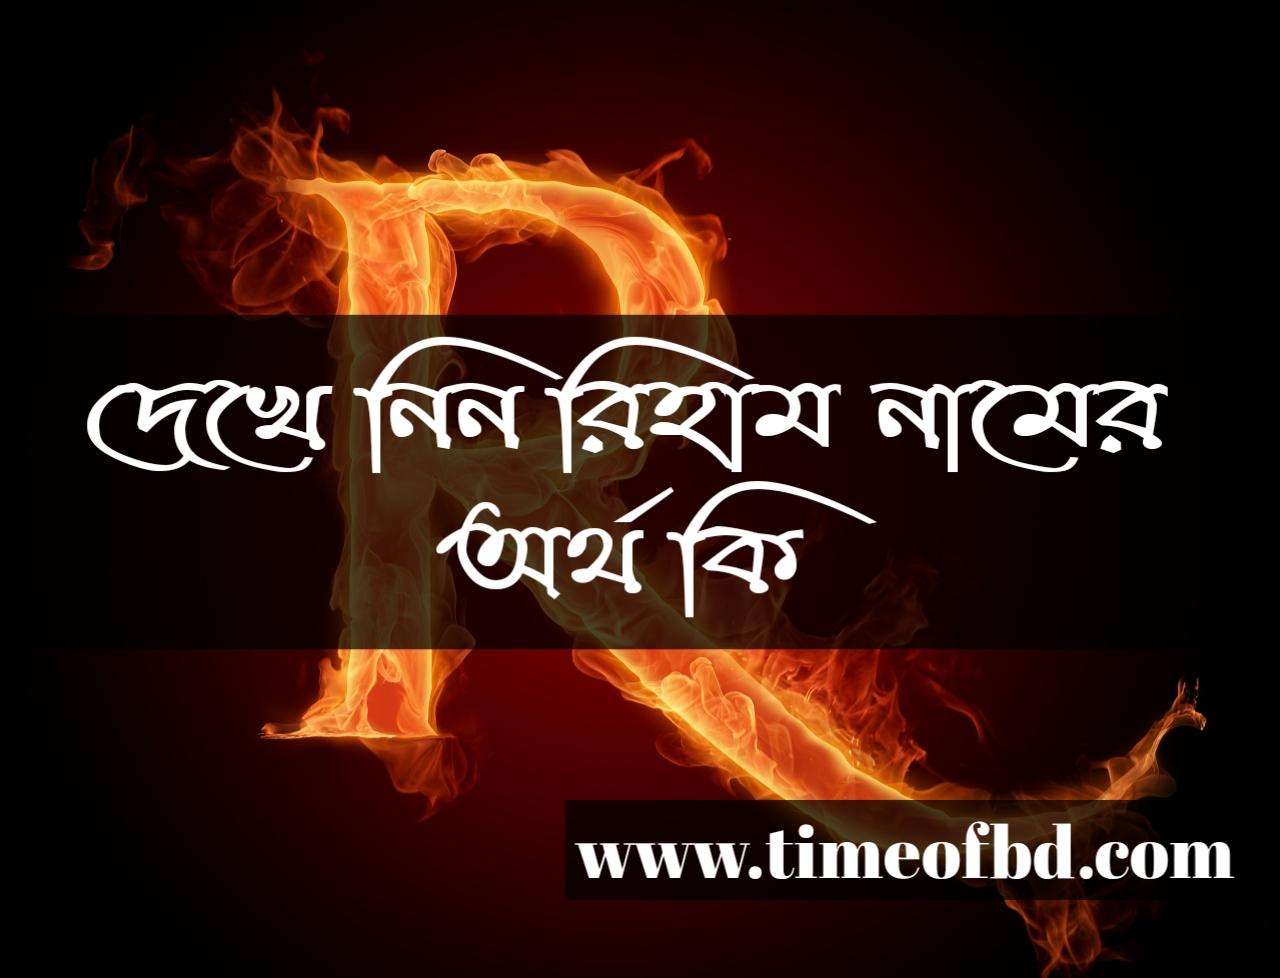 Riham name meaning in Bengali, রিহাম নামের অর্থ কি, রিহাম নামের বাংলা অর্থ কি, রিহাম নামের ইসলামিক অর্থ কি,